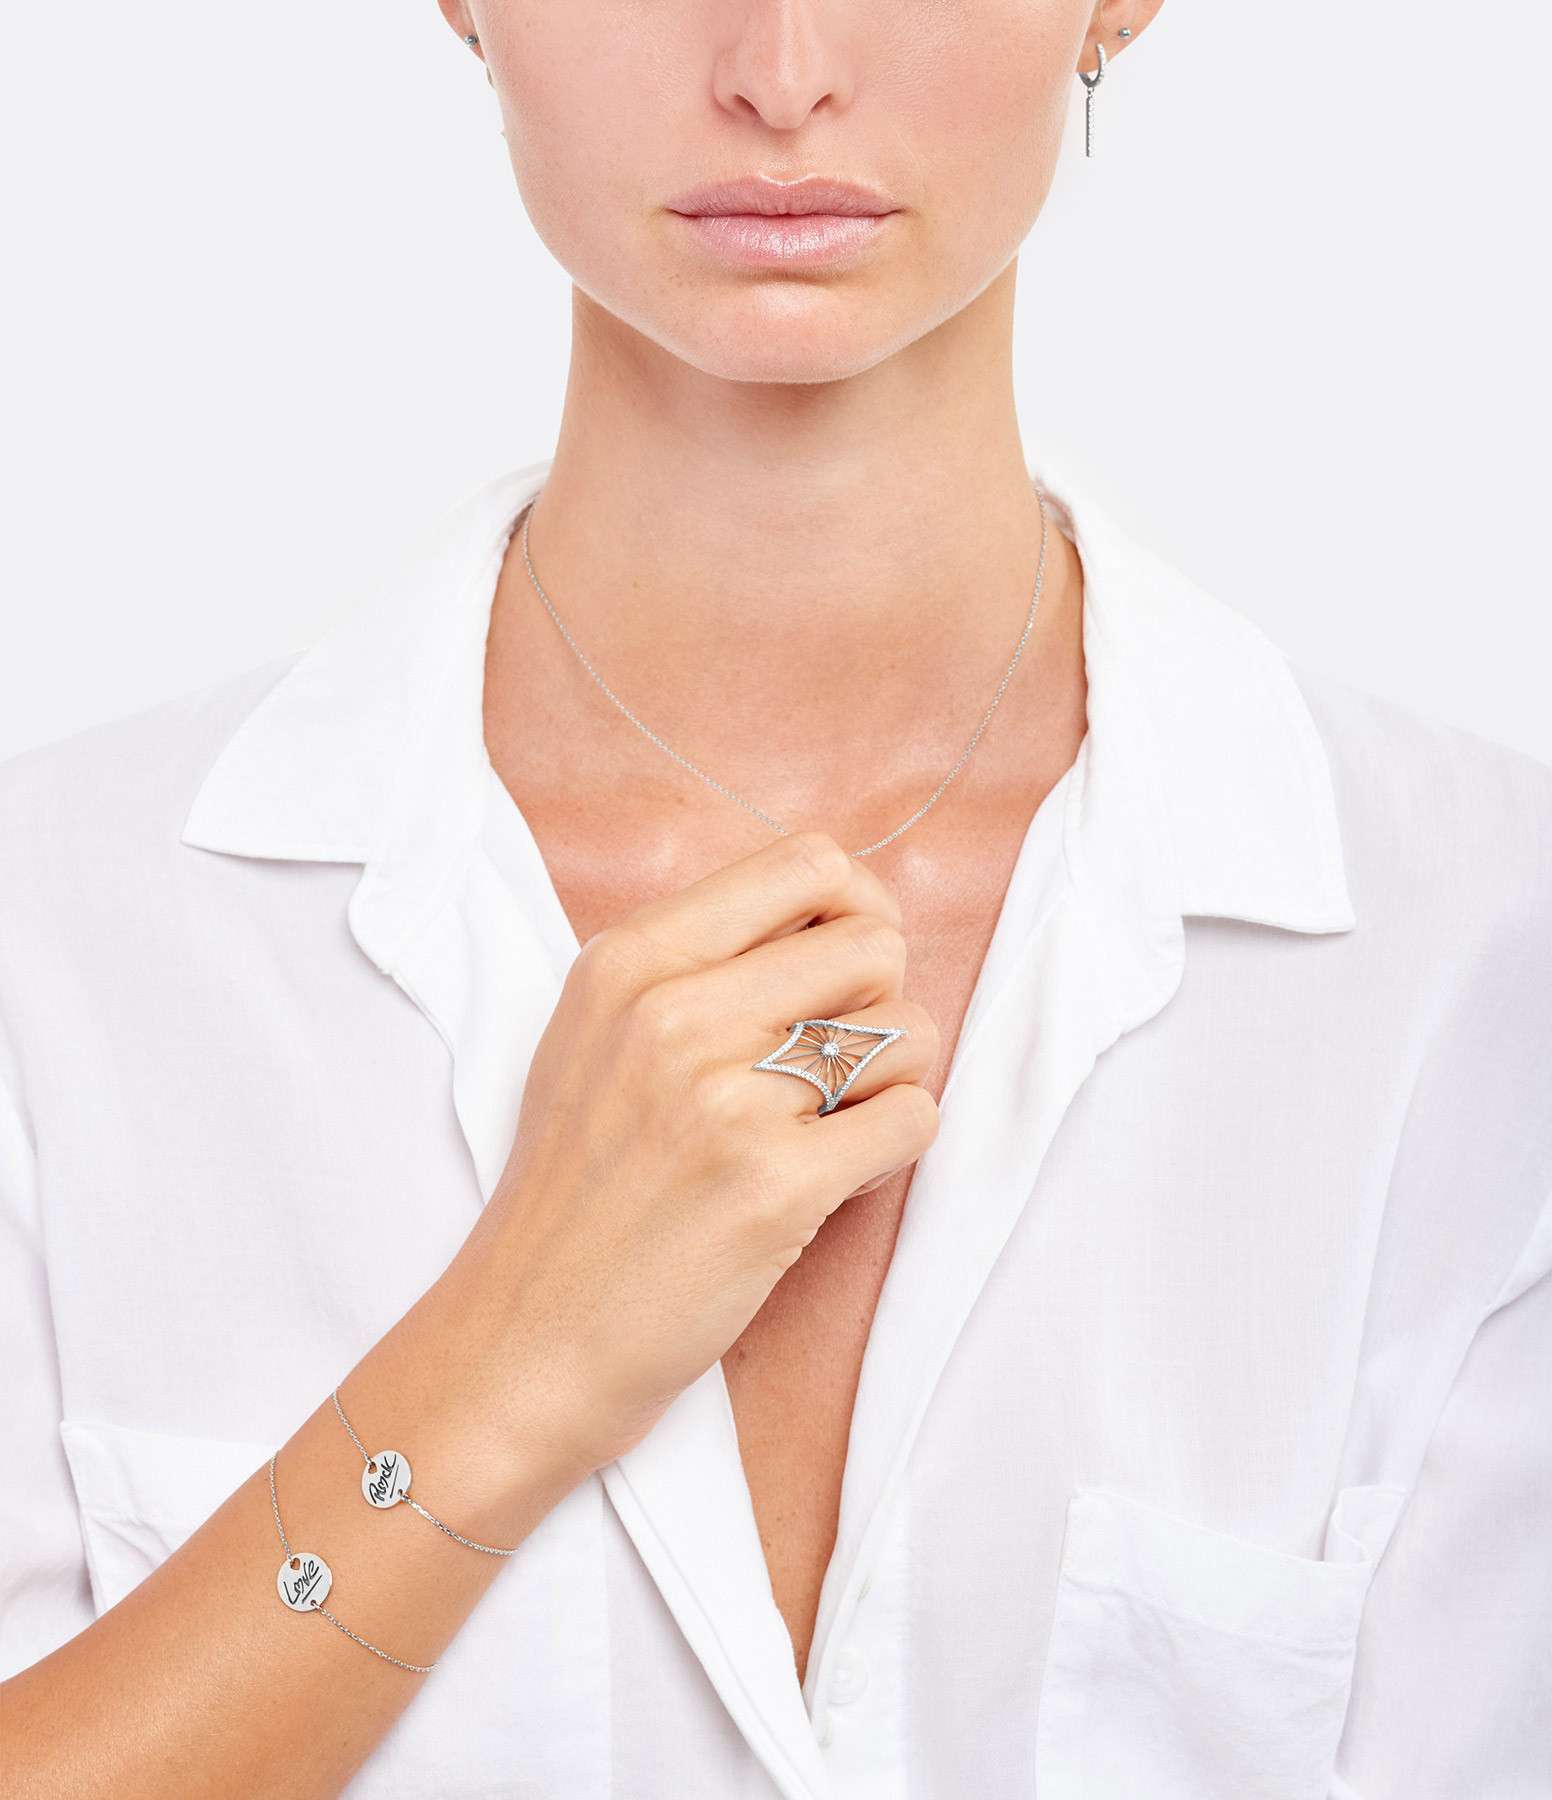 NAVA JOAILLERIE - Bague Cheyenne Losange Diamants Or Blanc